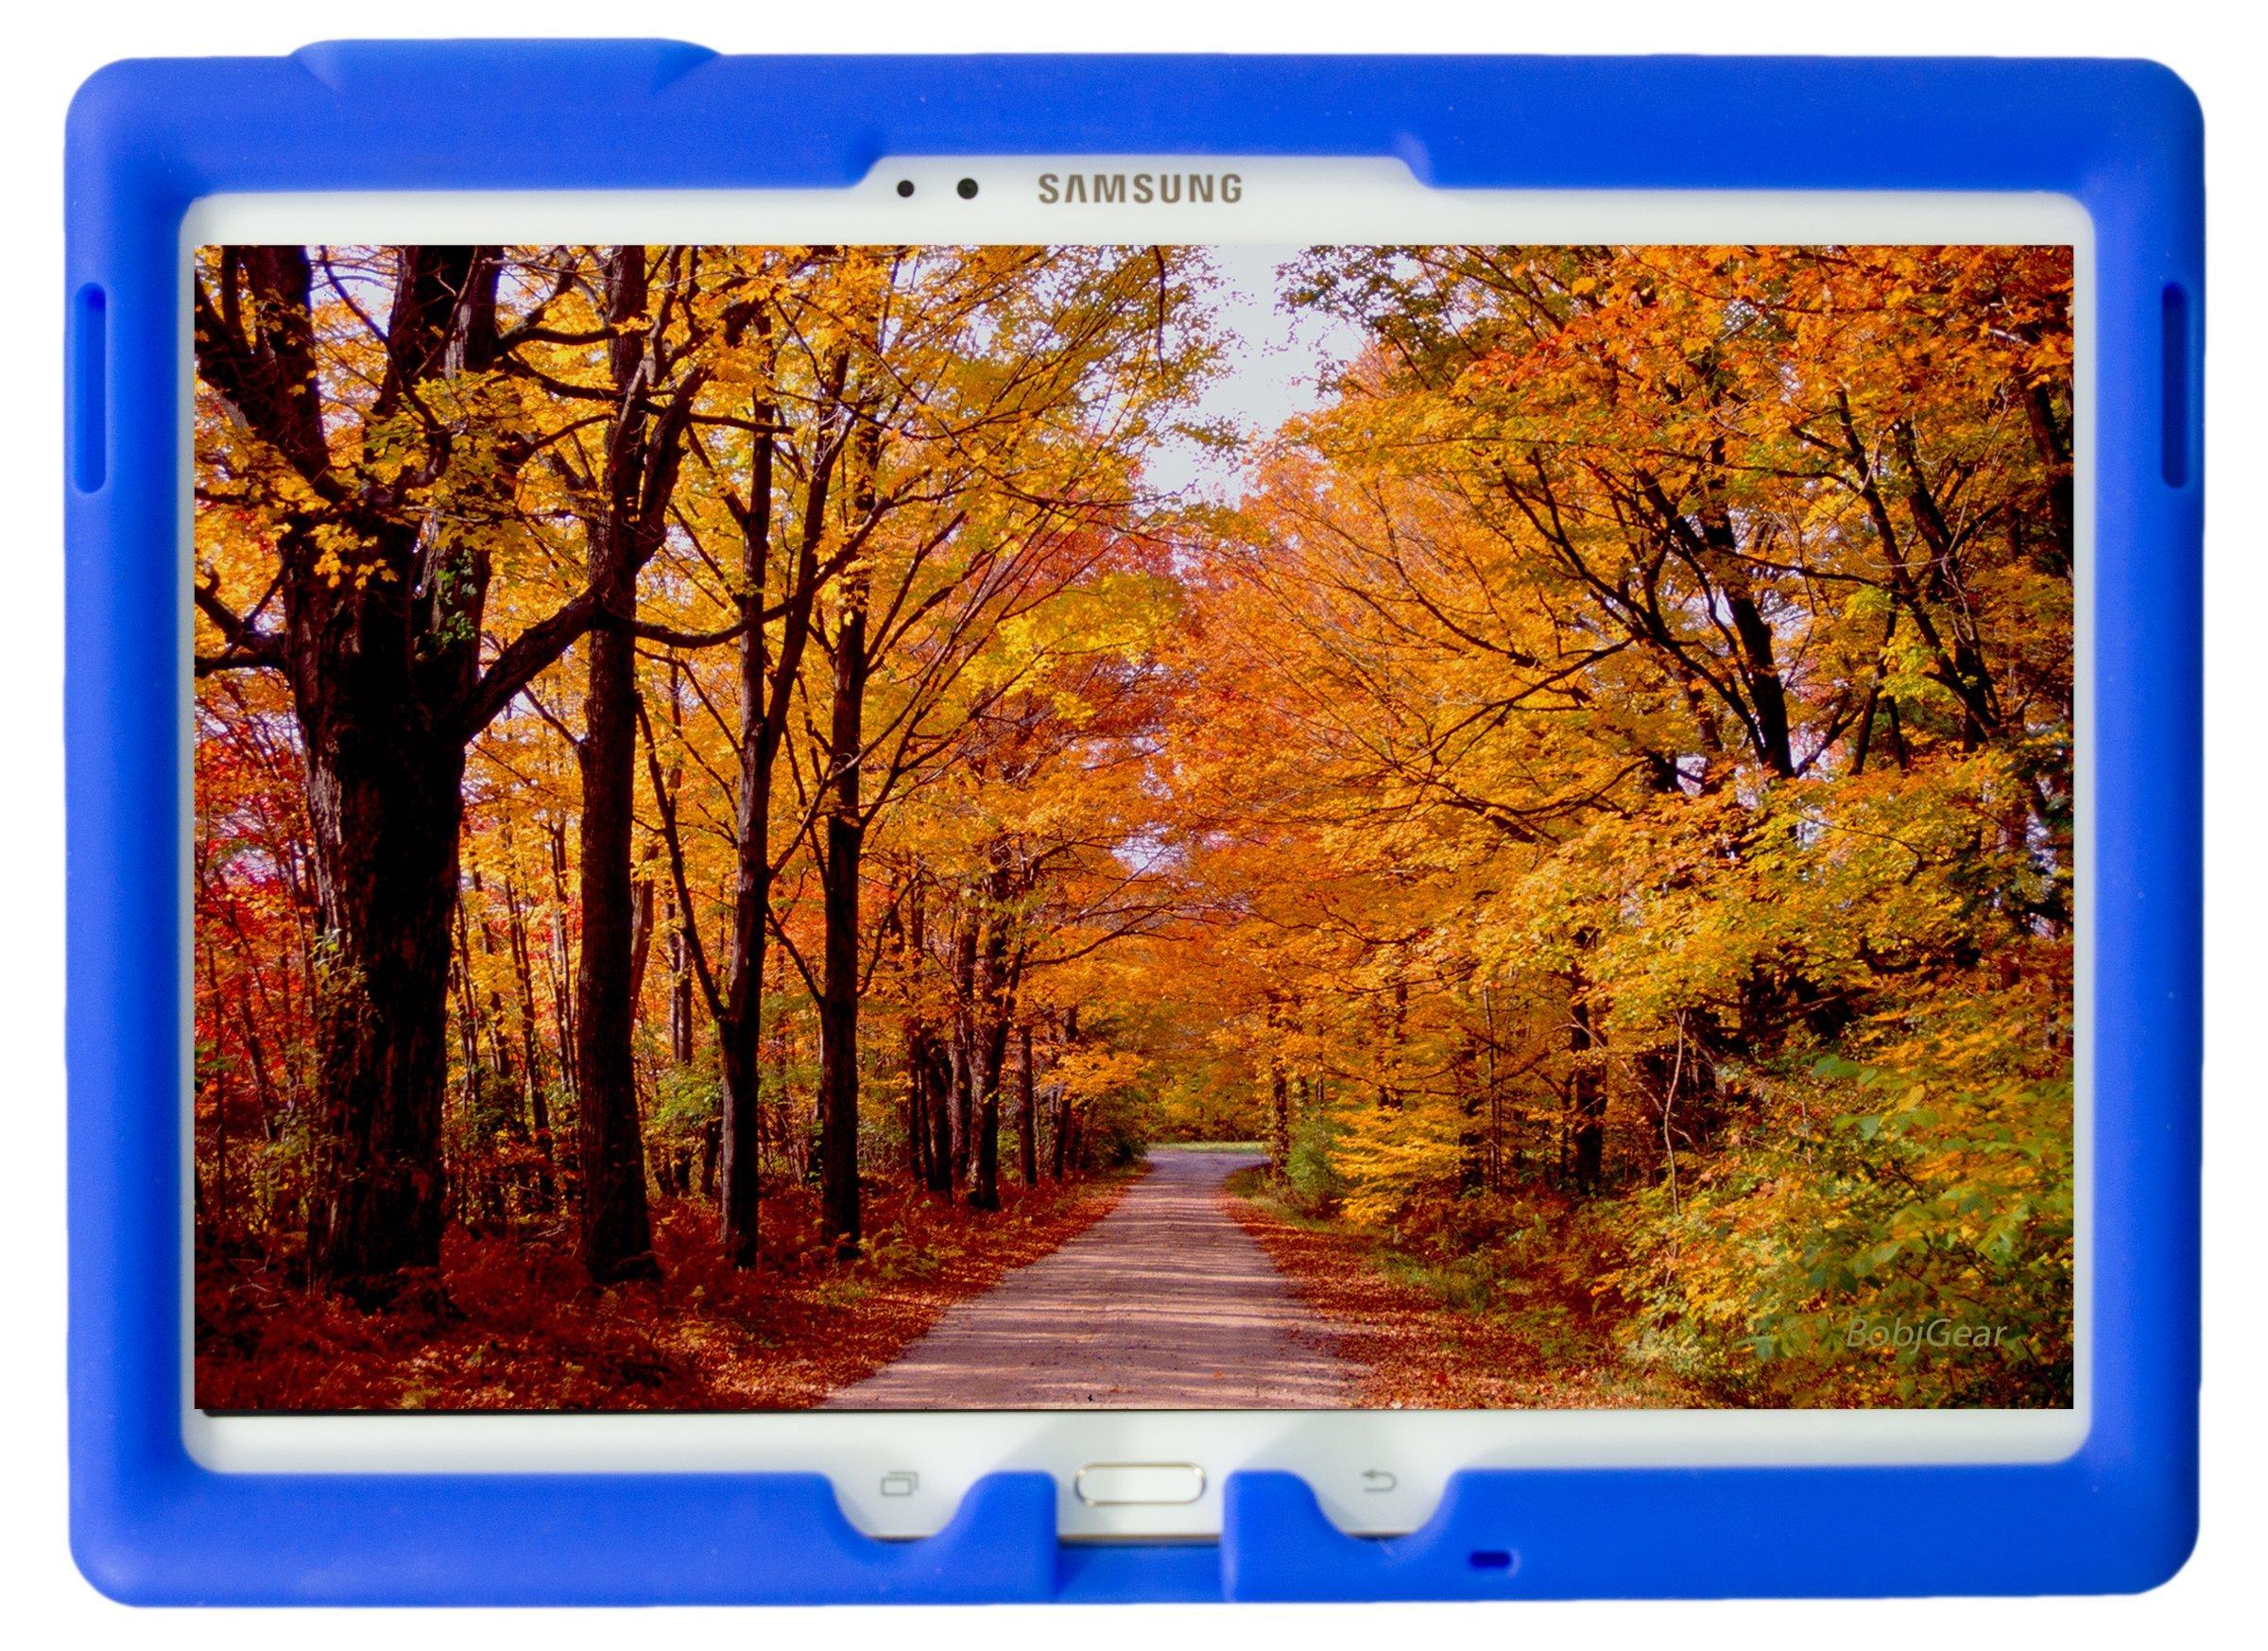 Funda Samsung Galaxy Tab S 10.5 BOBJGEAR [0MHX6Y12]